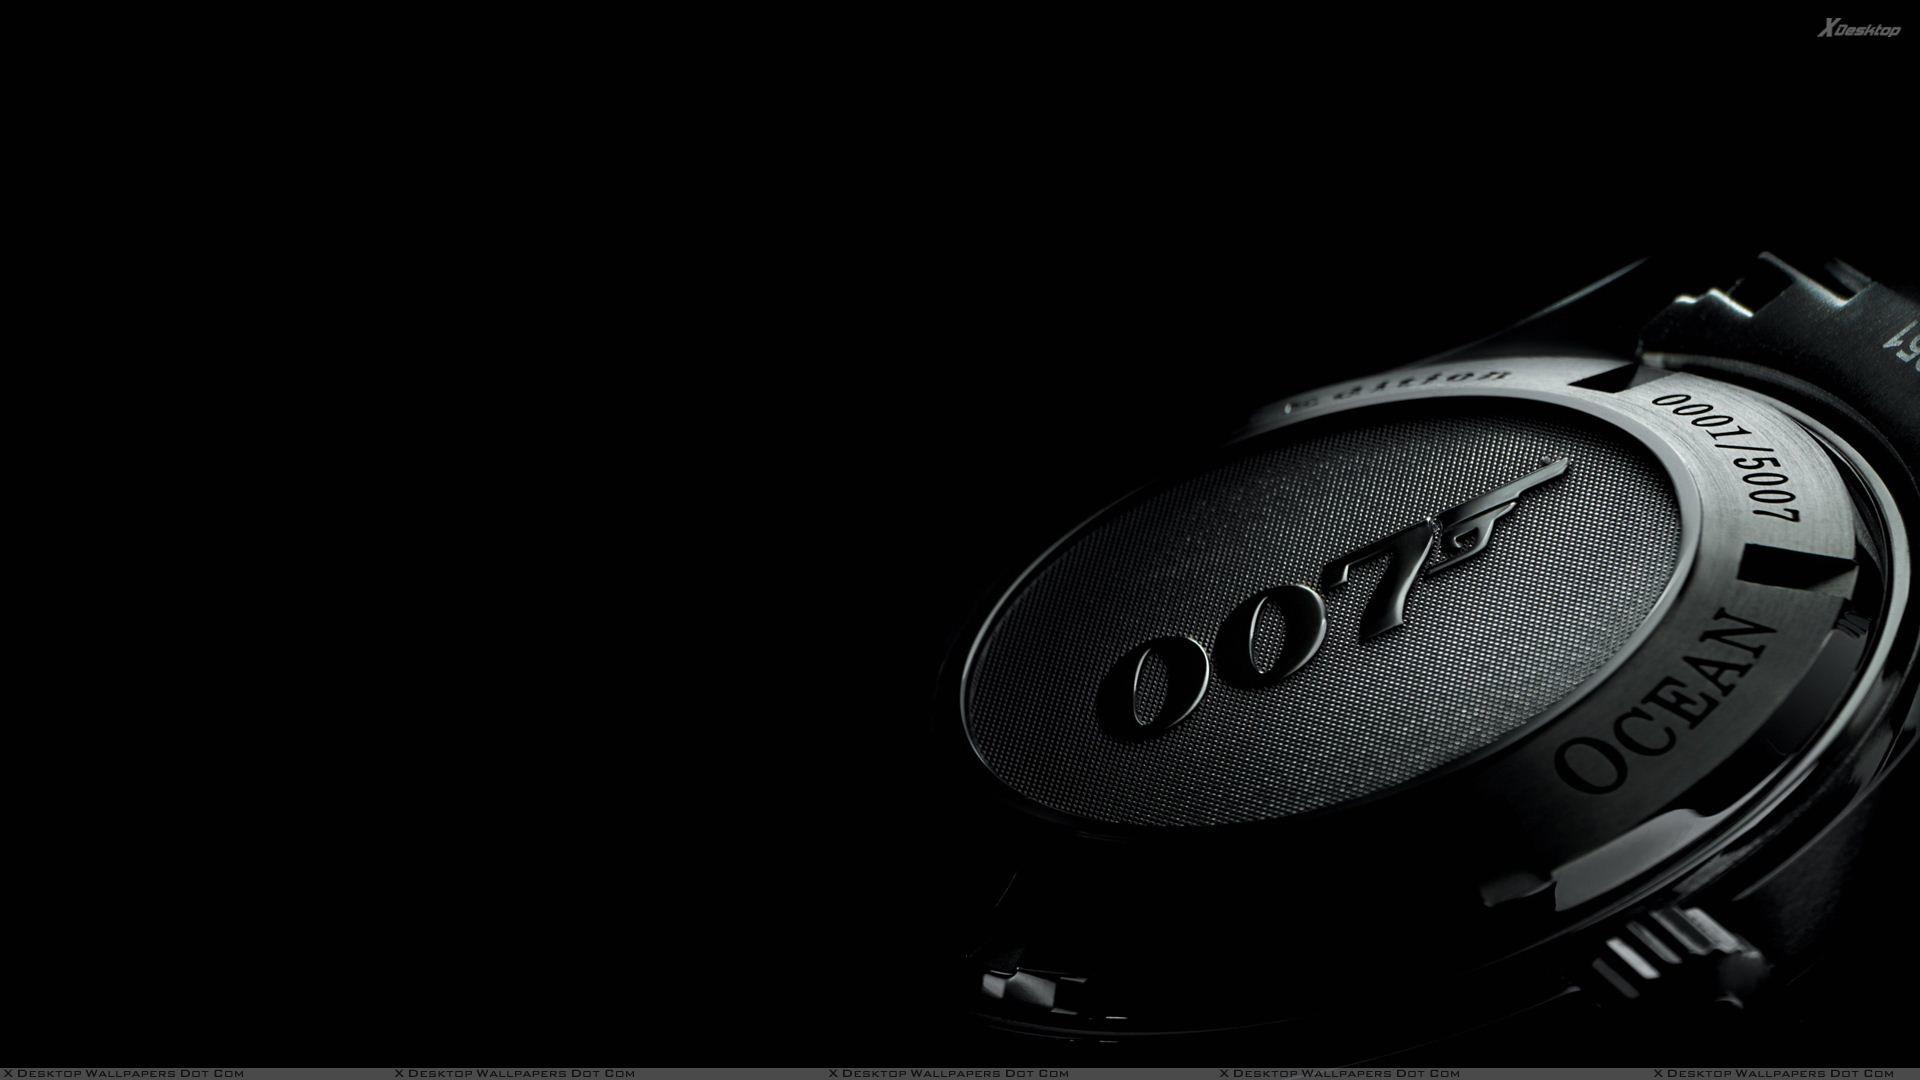 007 Logo Wallpaper (70+ images)